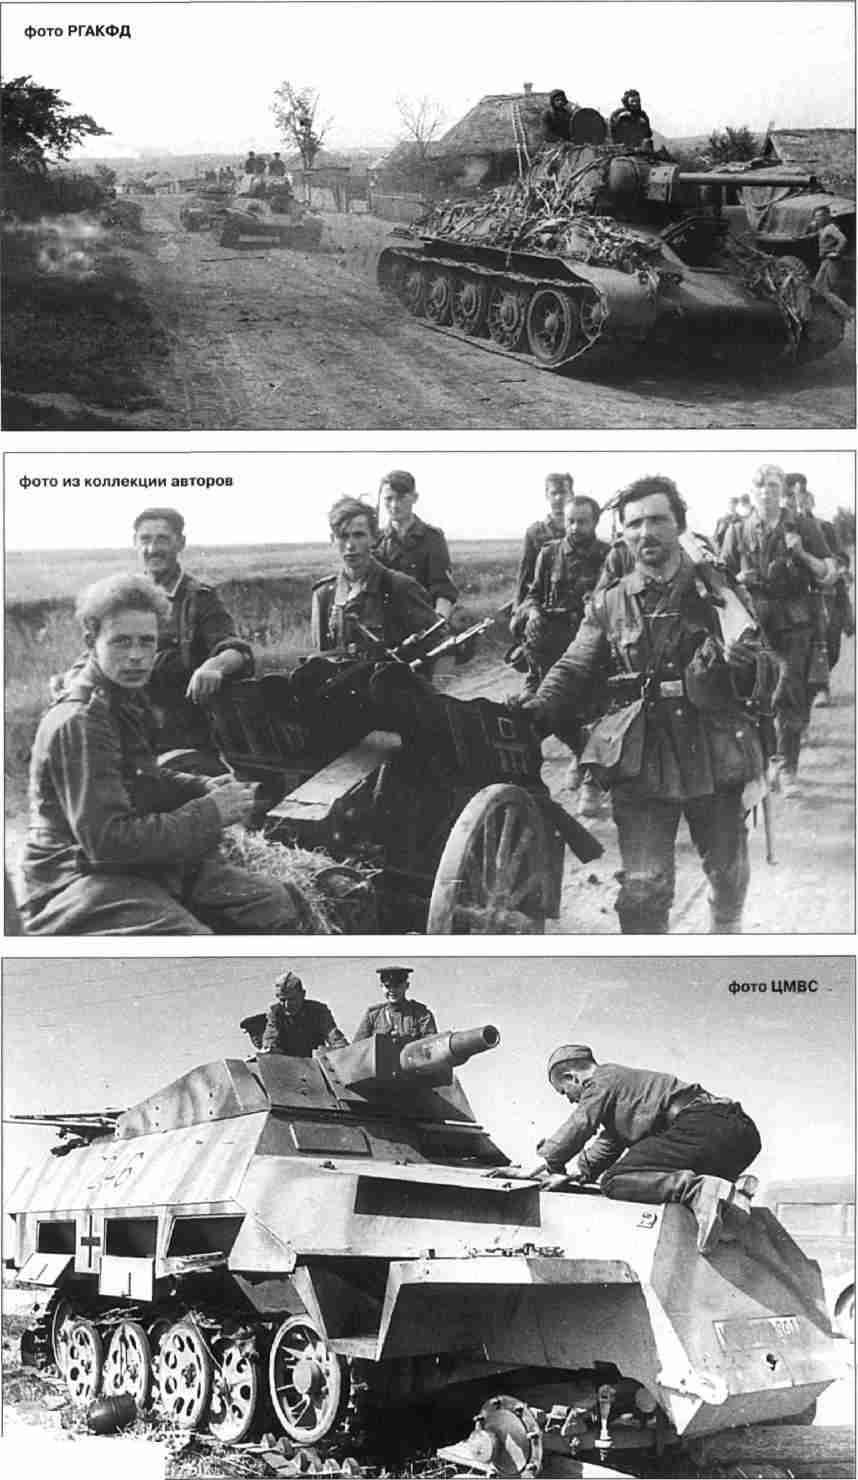 Верхний снимок— 3-я танковая армия в наступлении на Орёл.